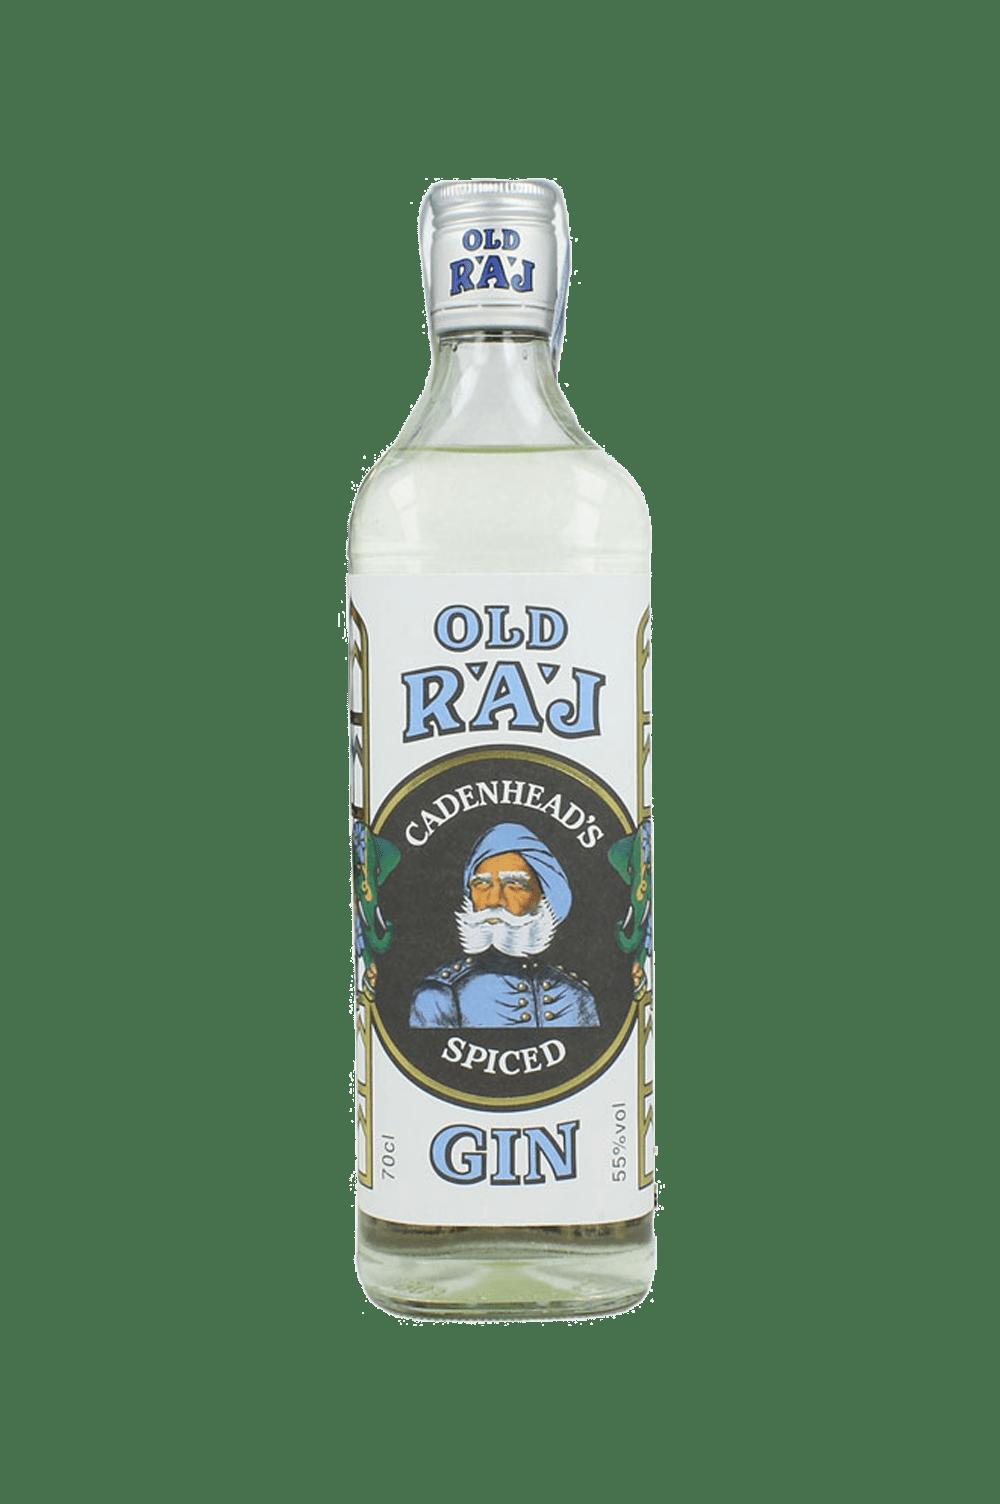 Cadenhead's Old Raj Spiced Gin Blue Label 55%